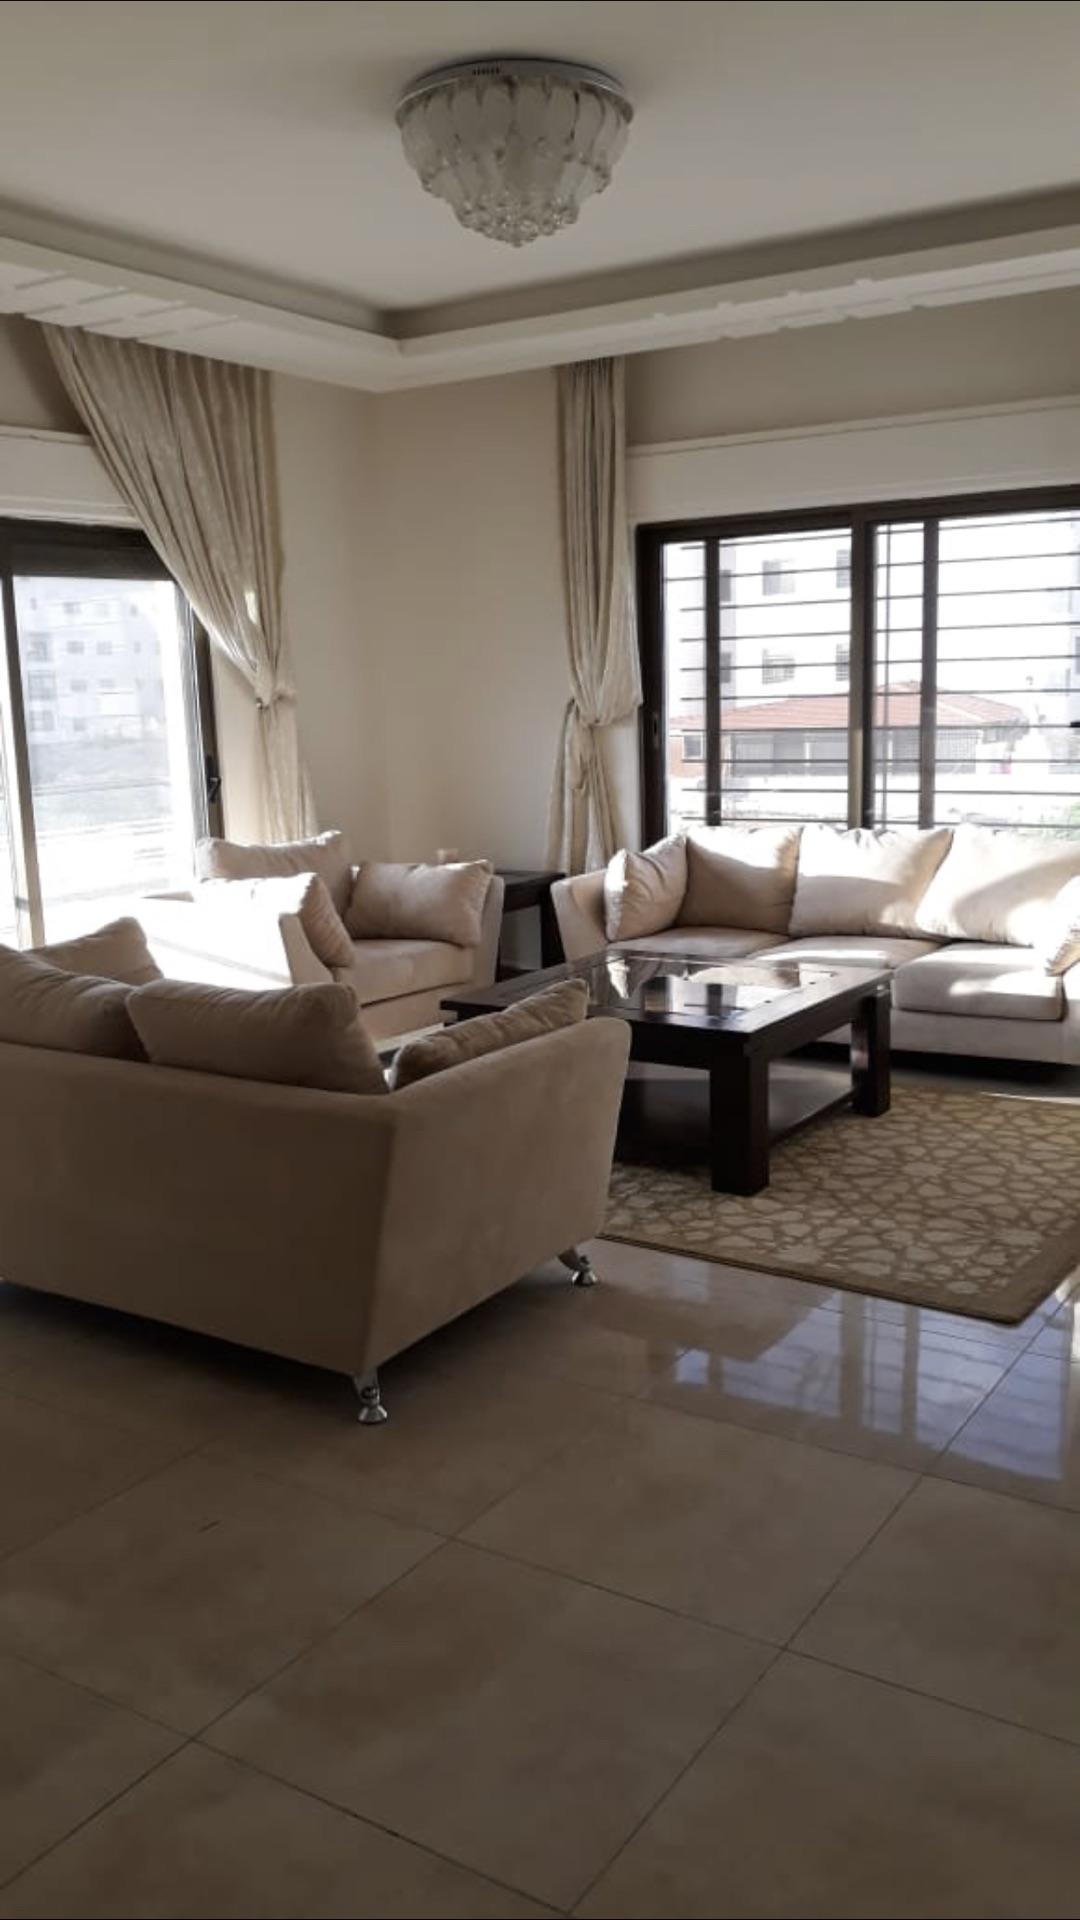 Full furnished flat for rent in ajman-  شقة مفروشه لا تنسَ أنك...